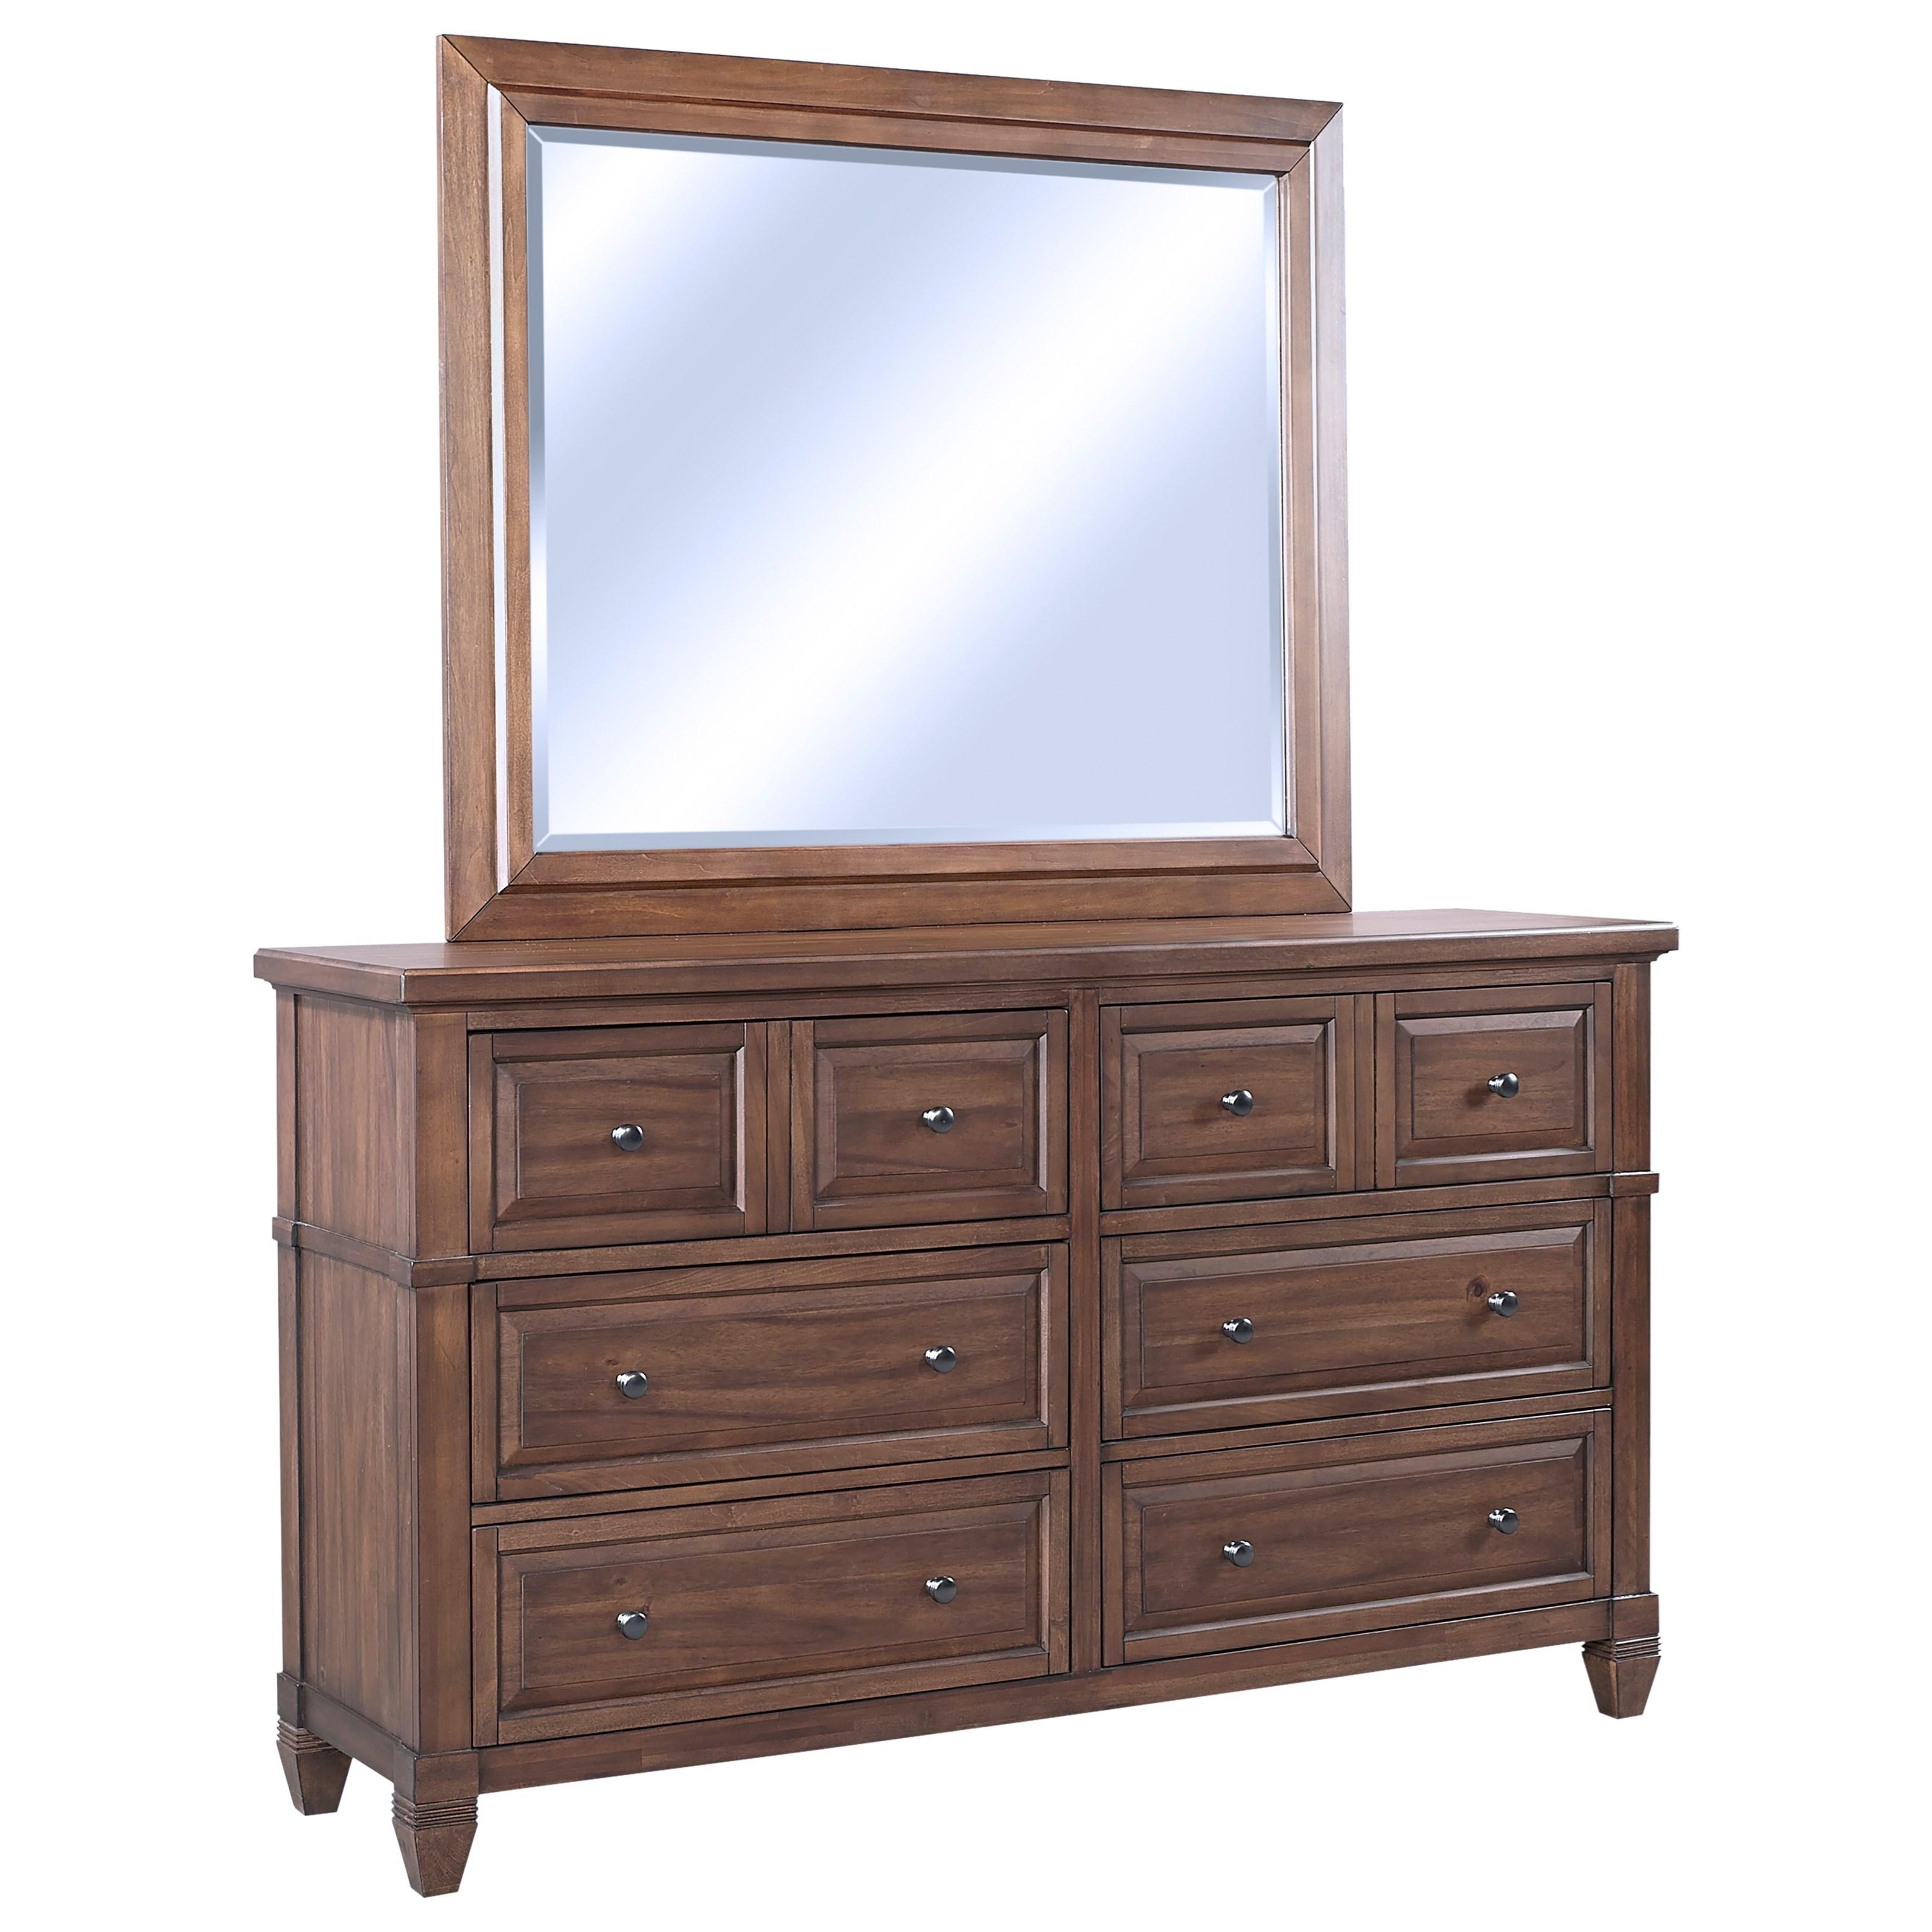 Thornton Dresser + Mirror Set by Aspenhome at Walker's Furniture